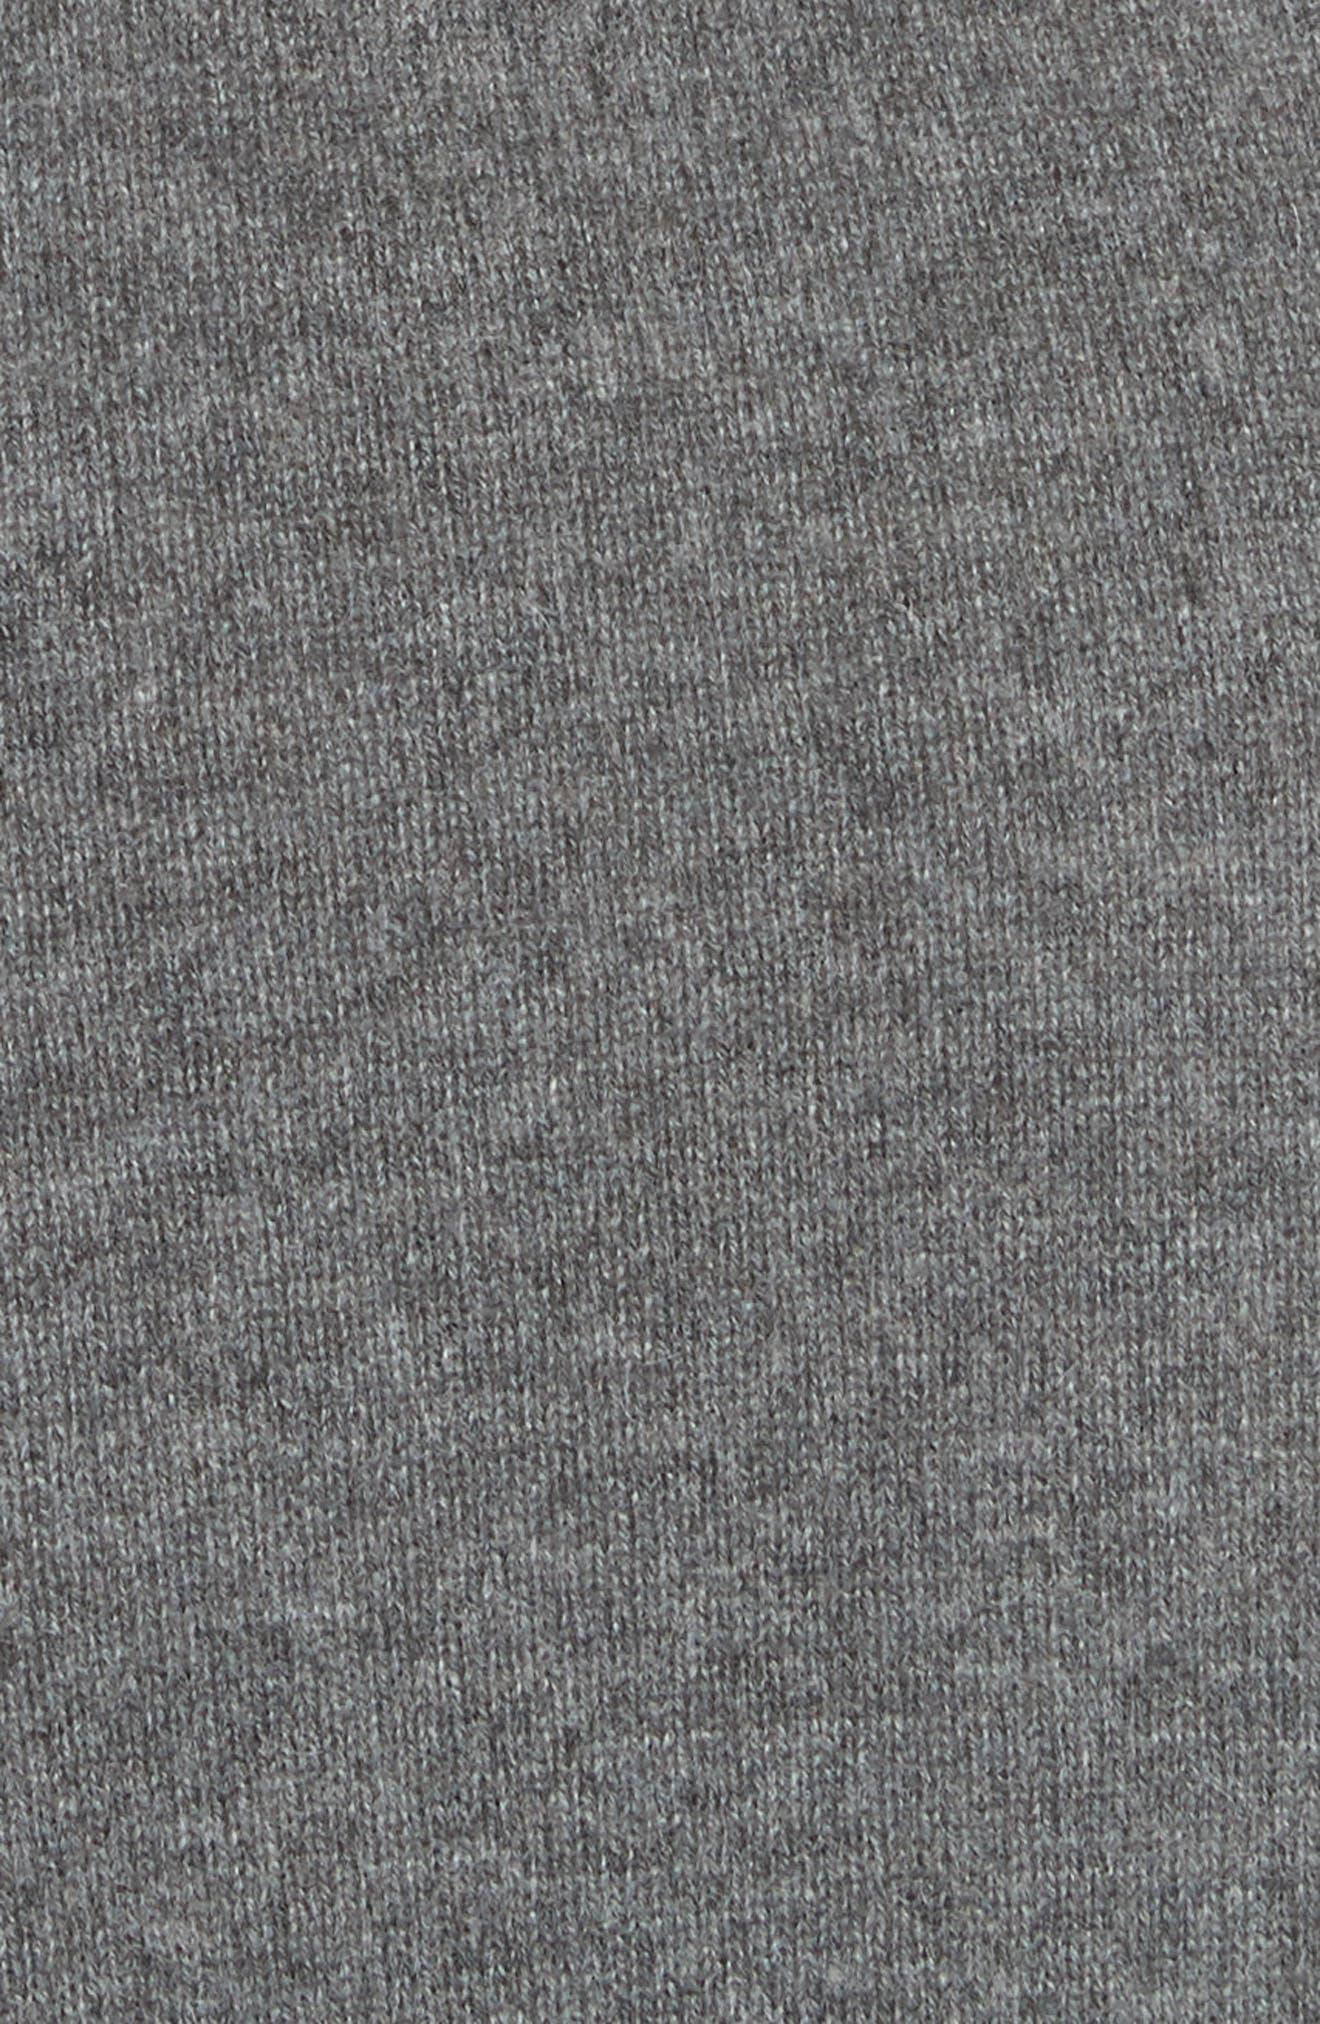 Diane Von Furstenberg Linda Cashmere Wrap Dress,                             Alternate thumbnail 9, color,